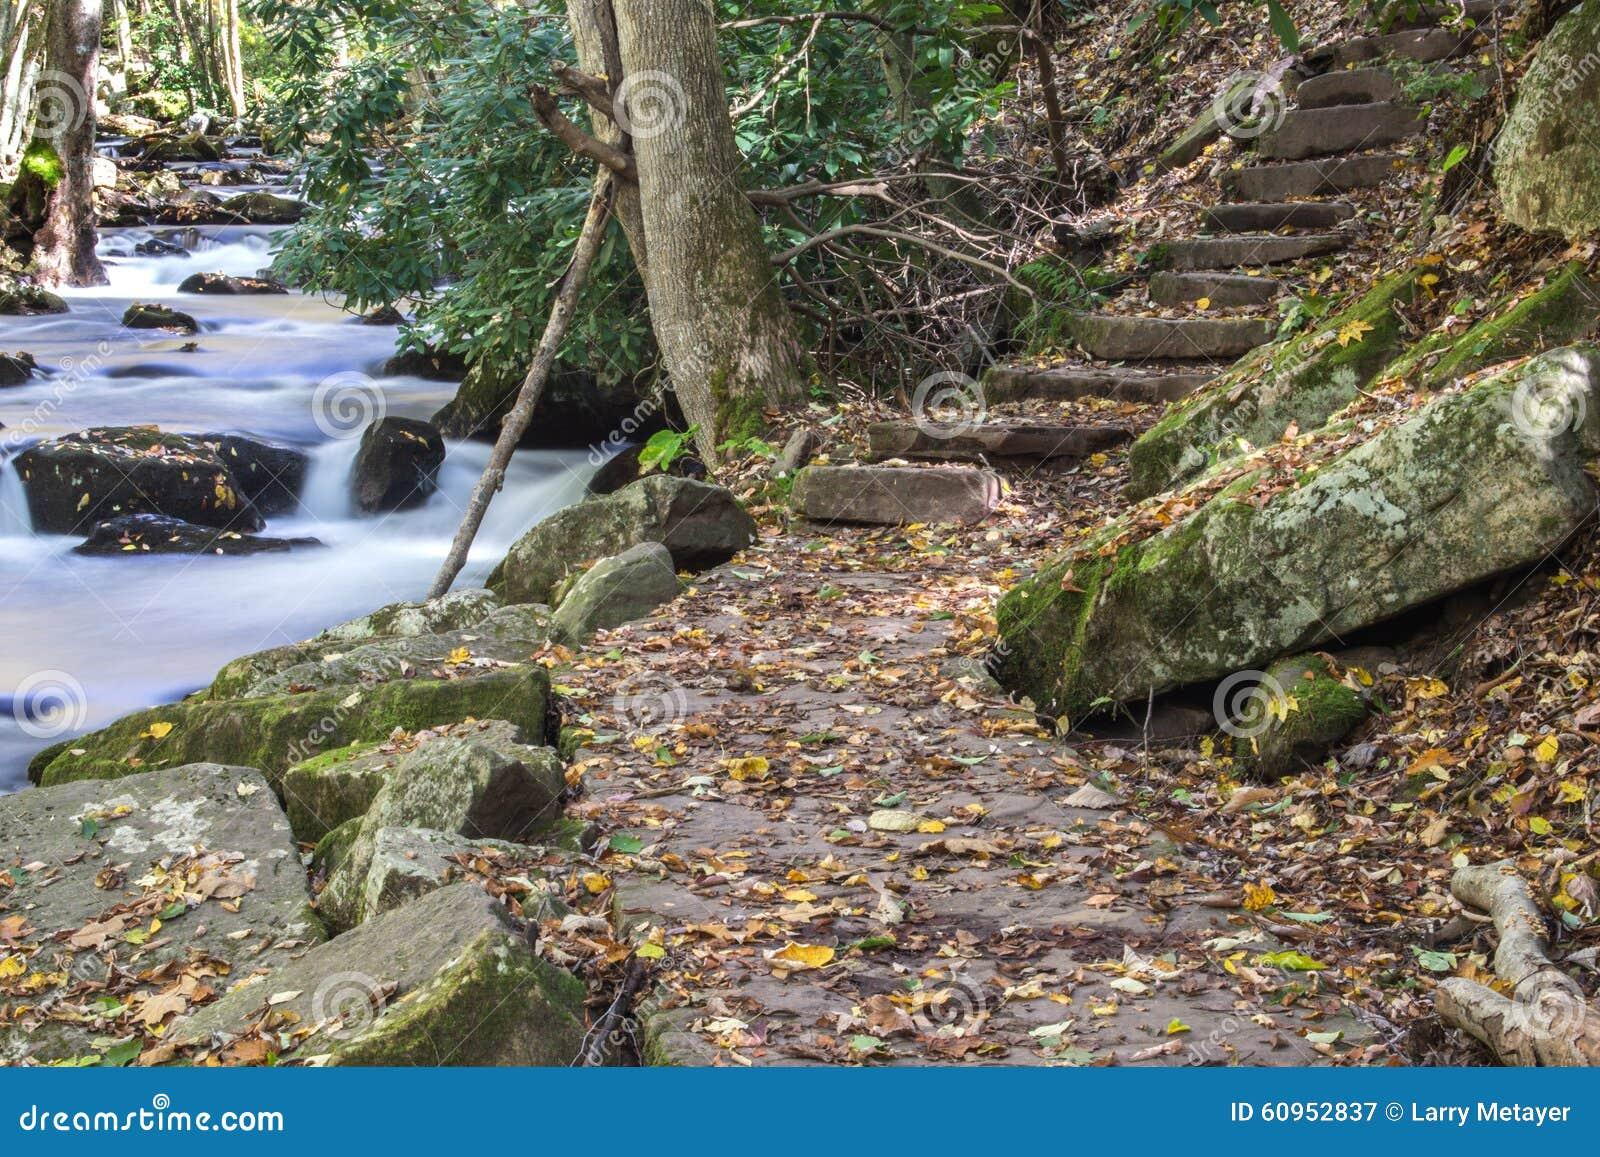 stone mountain park map with Stock Photo Hiking Trail Stone Steps Mountain Stream Located Giles County Virginia Usa Image60952837 on Fushimi Inari Taisha also 7788671936 further Zhoushan photo as well Saxon Switzerland d6053353 likewise PA Ly ing County Pennsylvania 1911 Map Rand McNally Williamsport.